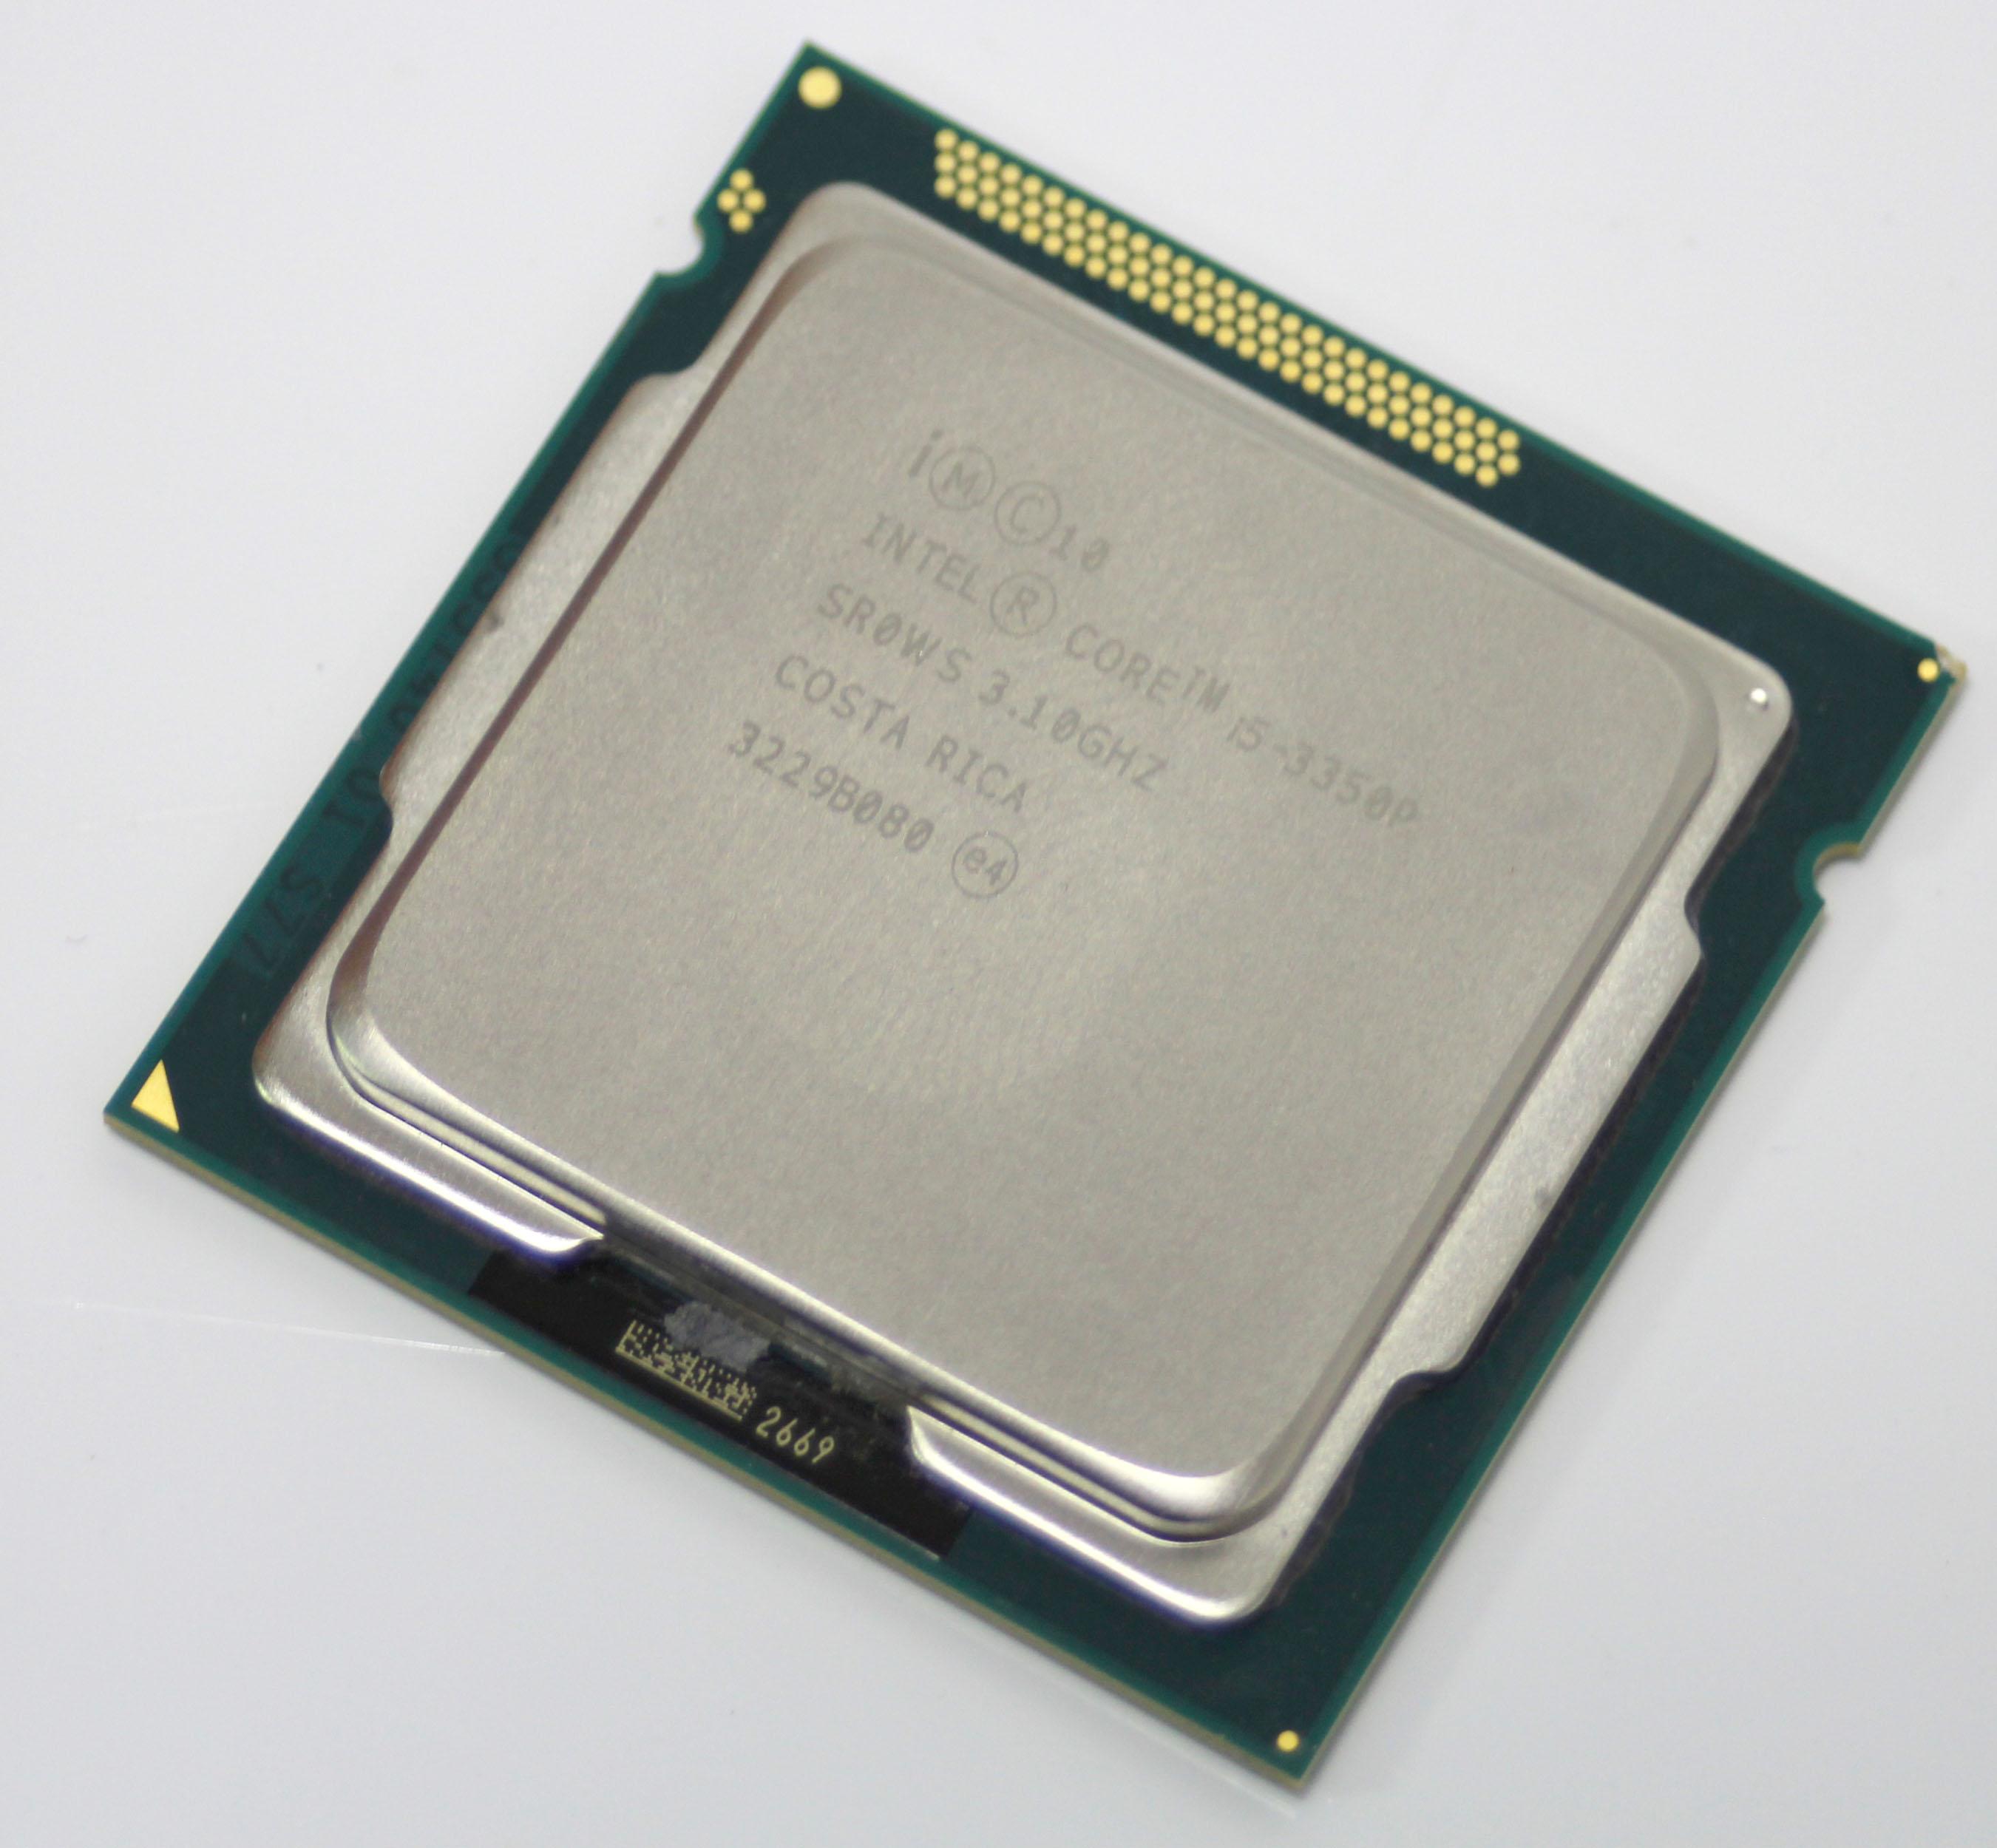 intel core i5 3350p 3 1 ghz processor fc lga1155 cpu prozessor ebay. Black Bedroom Furniture Sets. Home Design Ideas